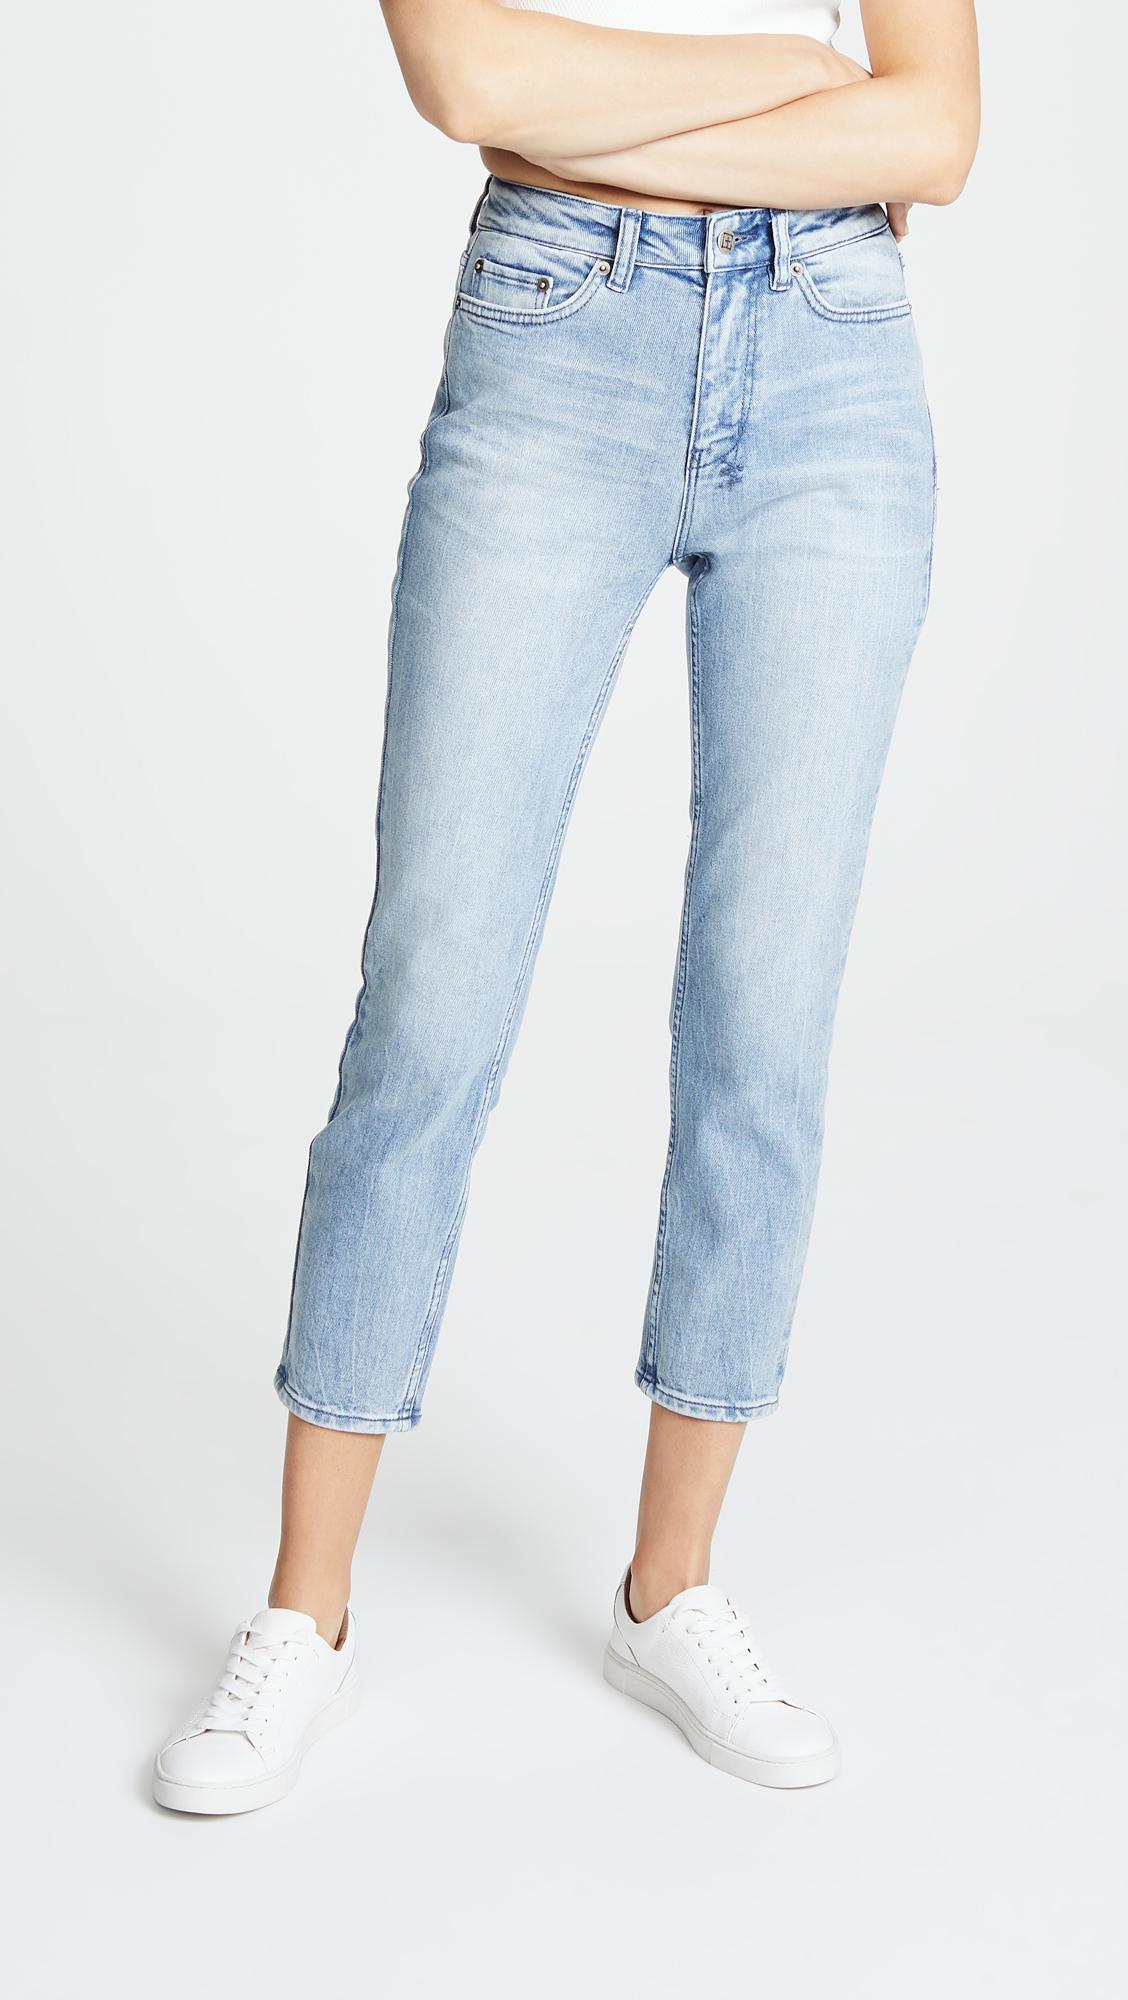 straight-leg cropped jeans - Blue Ksubi hz2jNJN